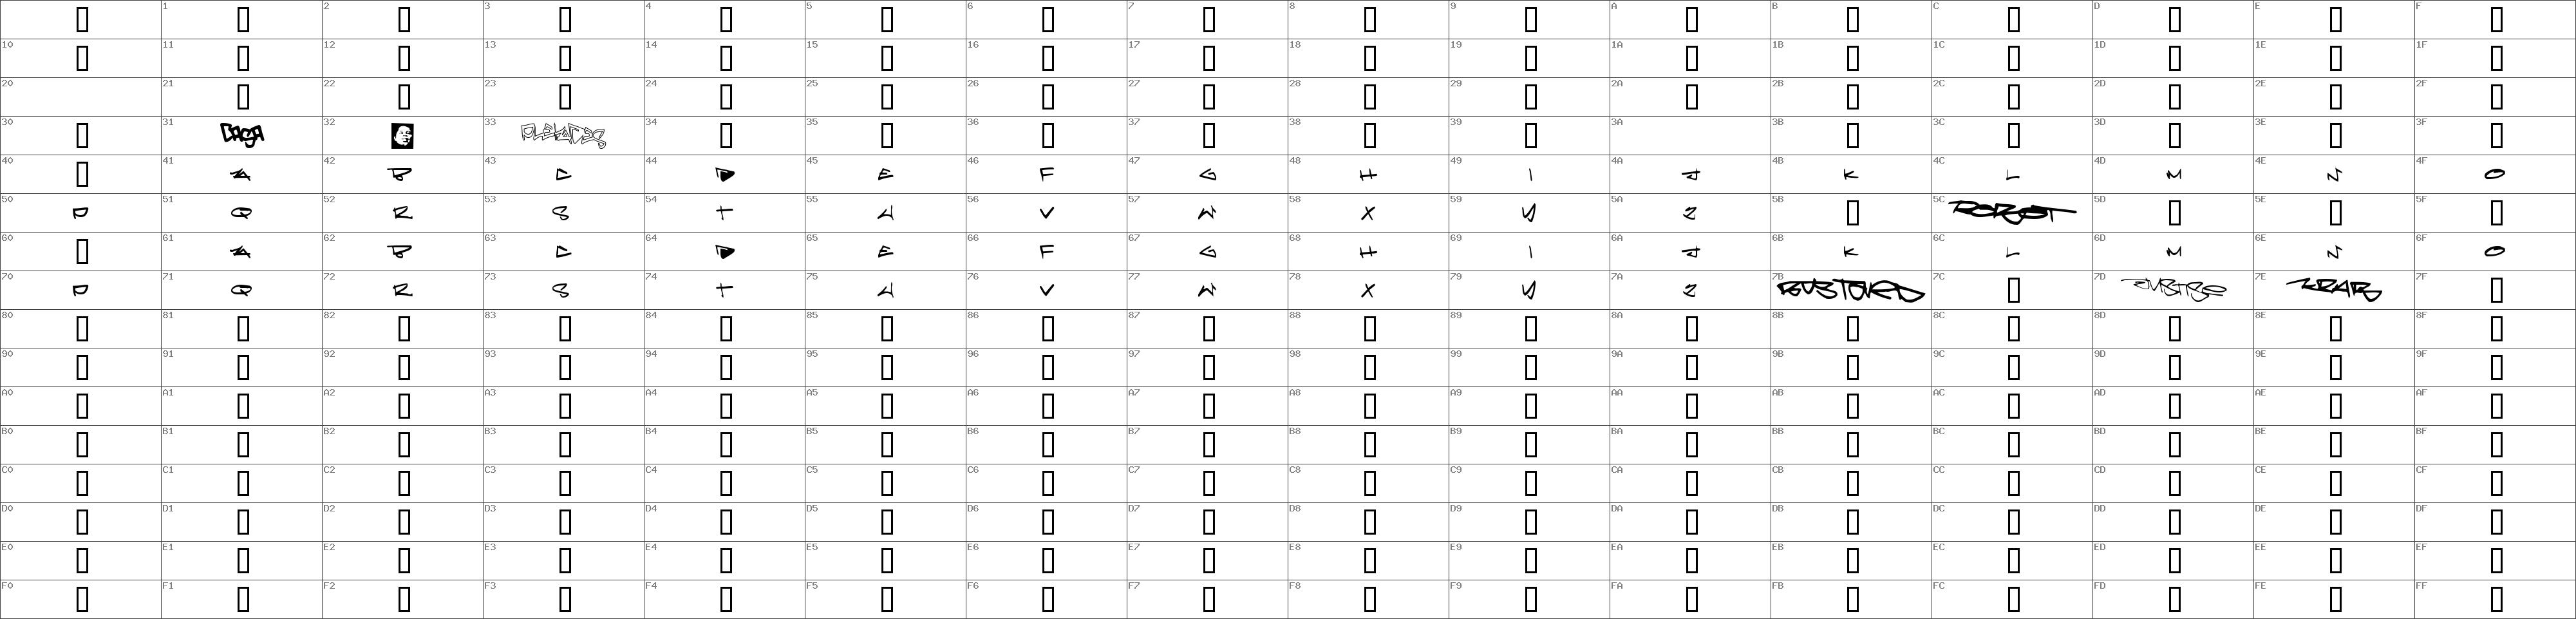 pleiades-regular-7664